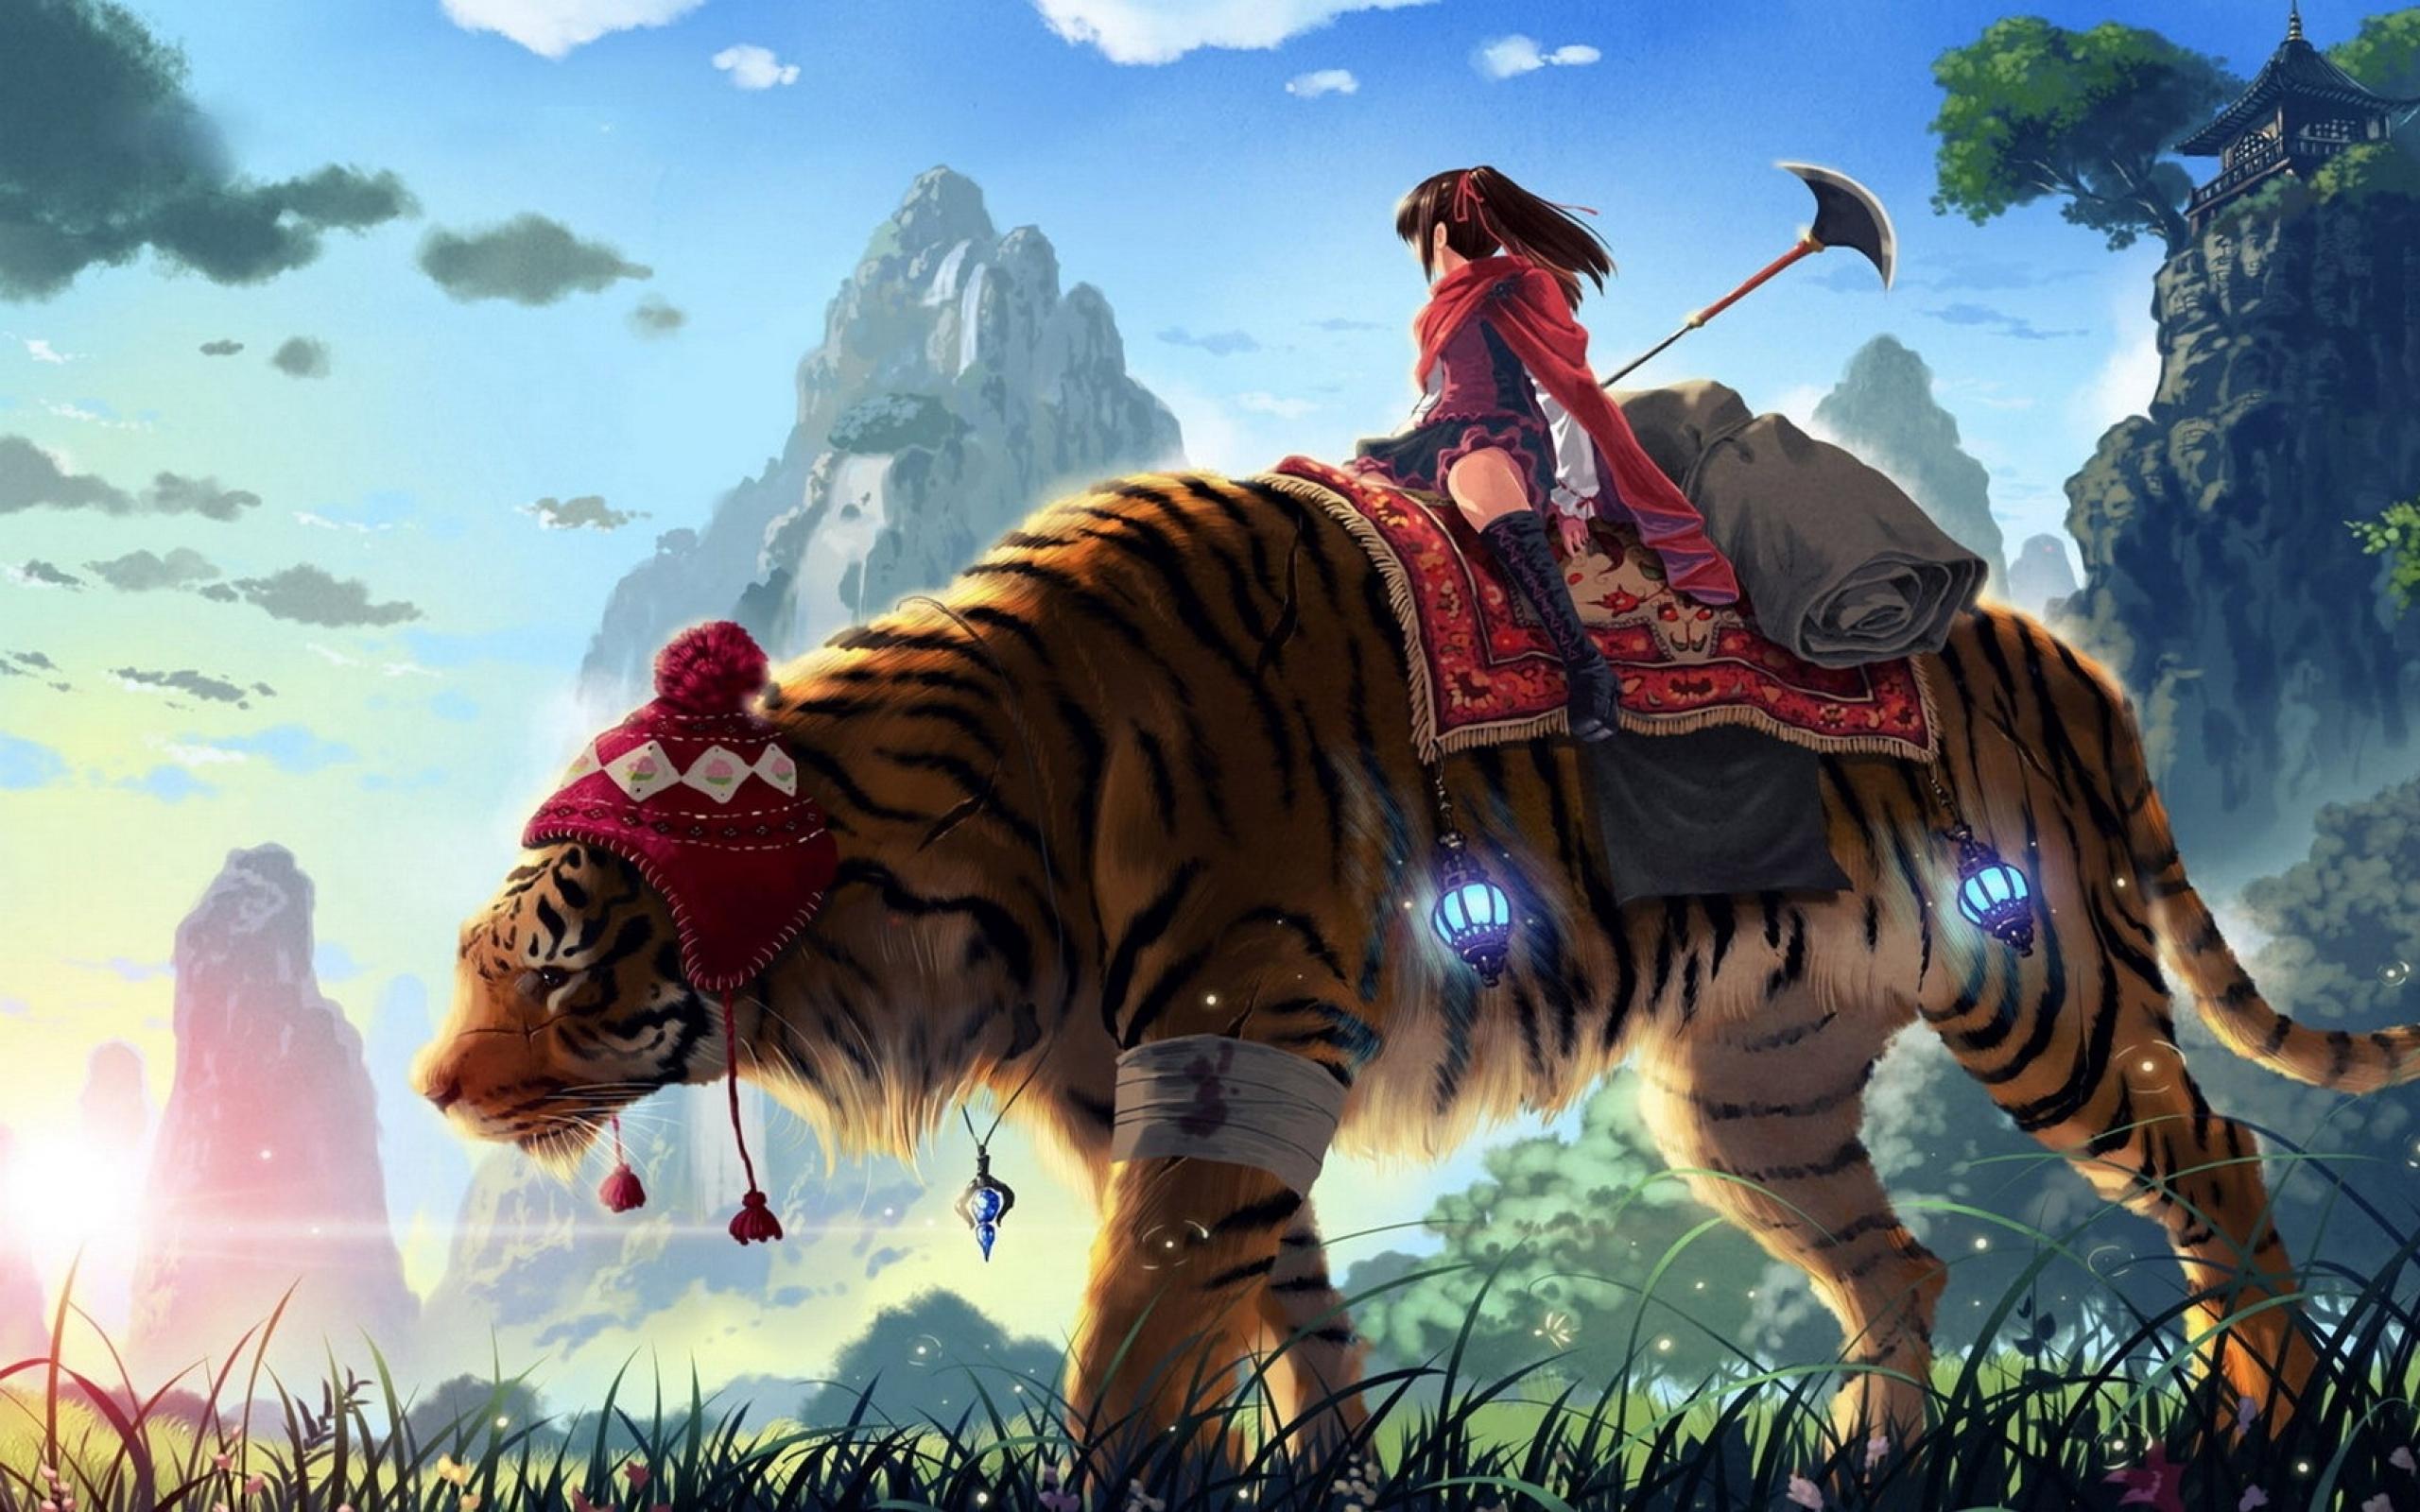 Epic Animated 3D Movie Wallpaper HD Desktop Fo #5864 Wallpaper ...